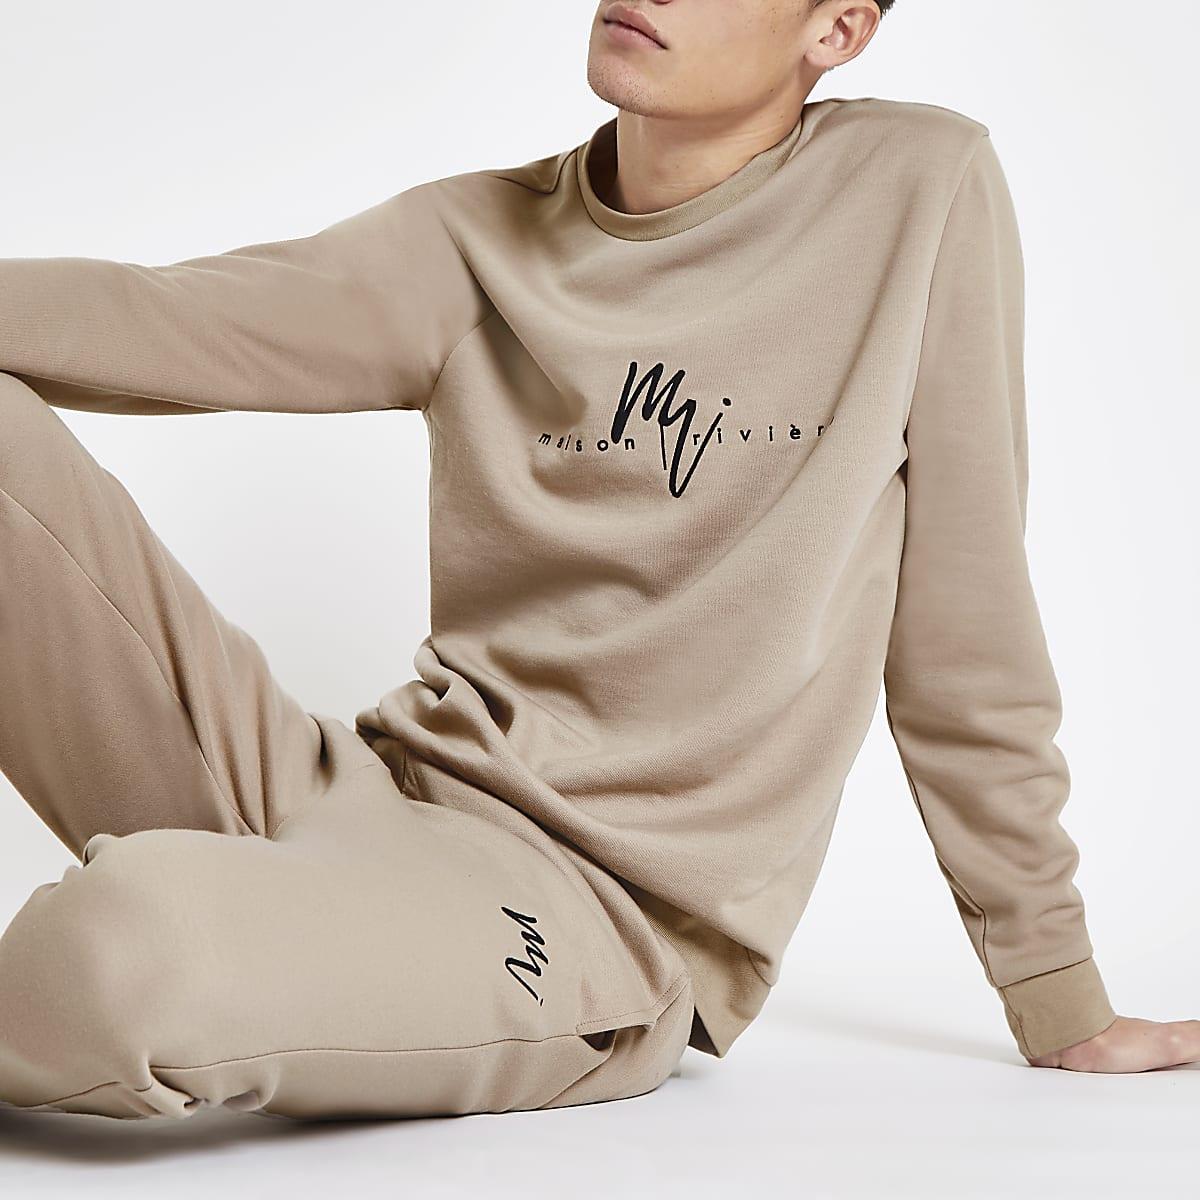 Maison Riviera - Kiezelkleurig slim-fit sweatshirt